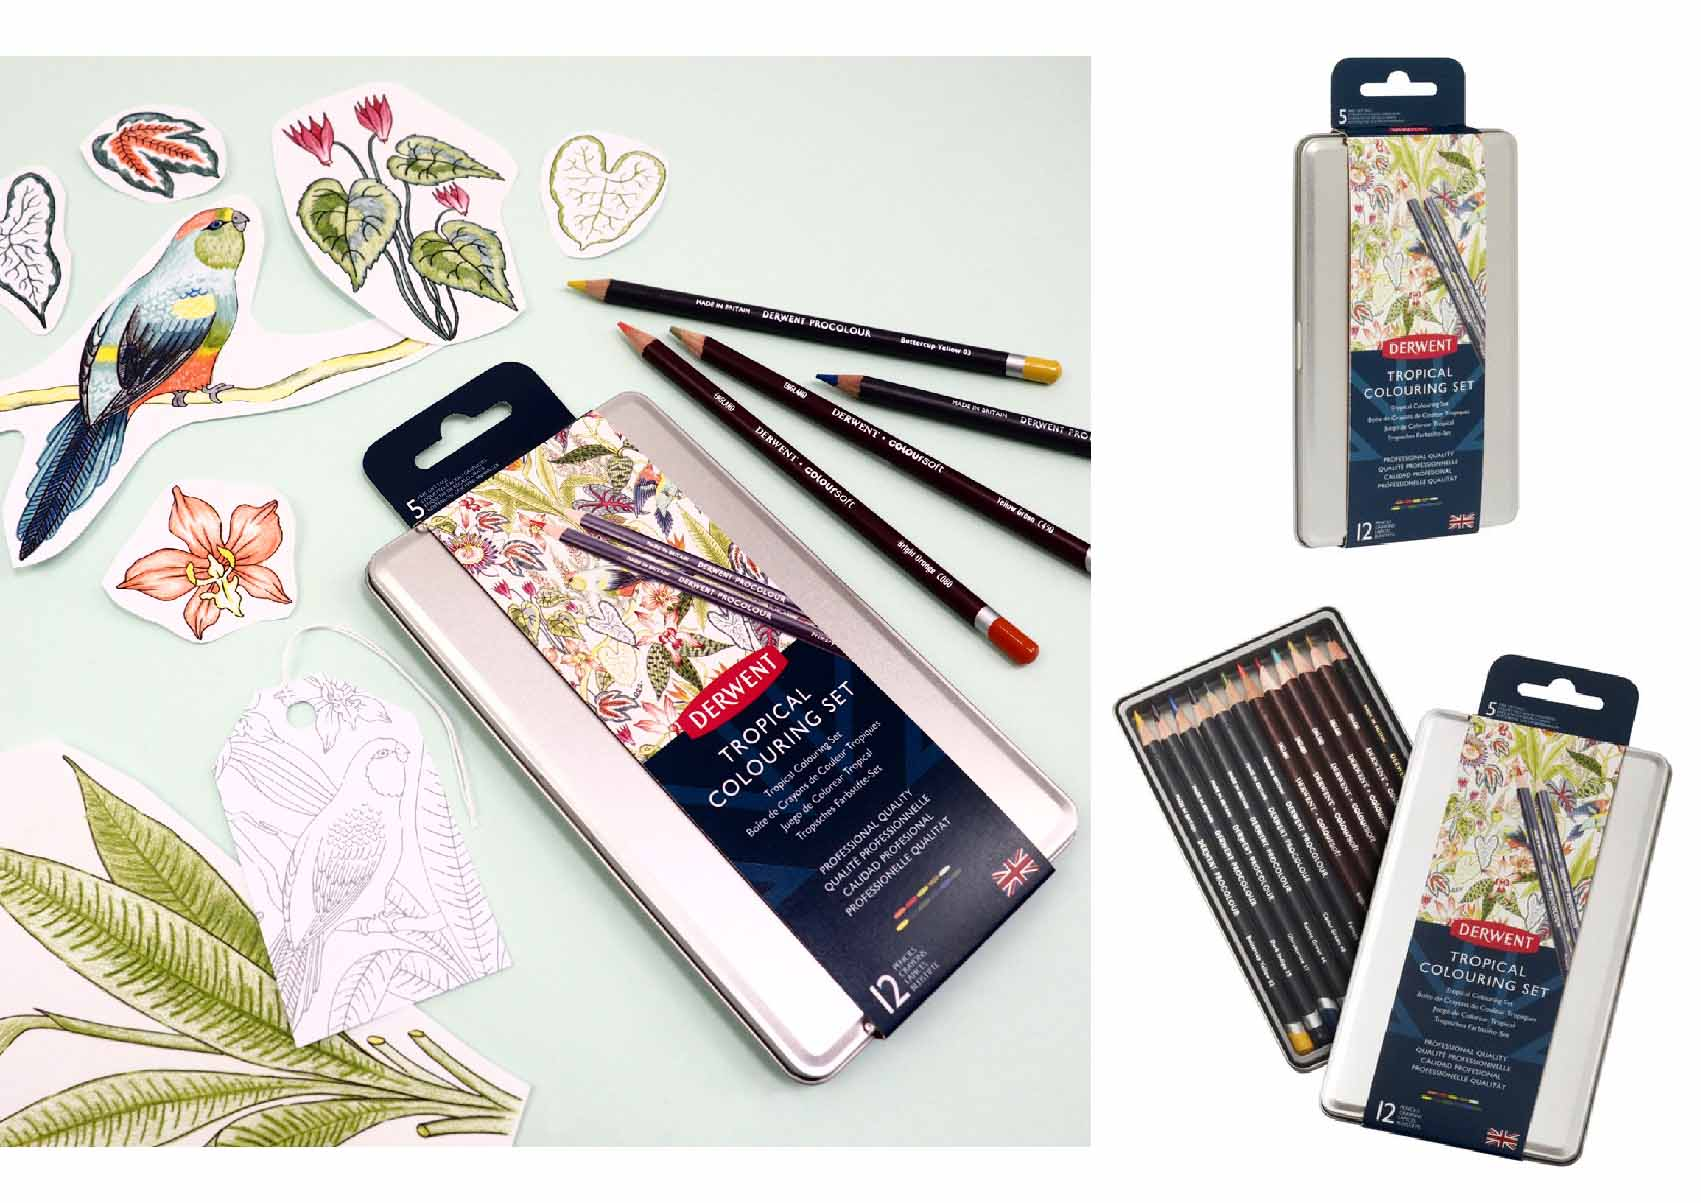 Derwent-Tropical-Pencil-set-Illustration-Pattern-Jacqueline-Colley-3.jpg